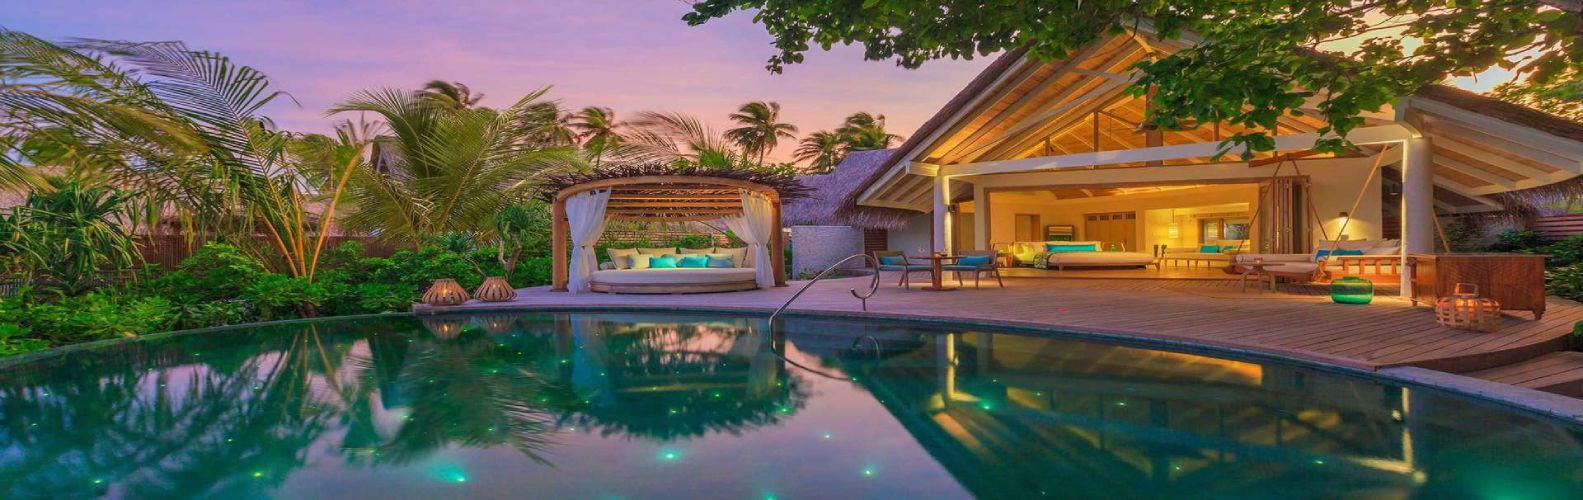 Milaidhoo Island Maldives - OFFERS